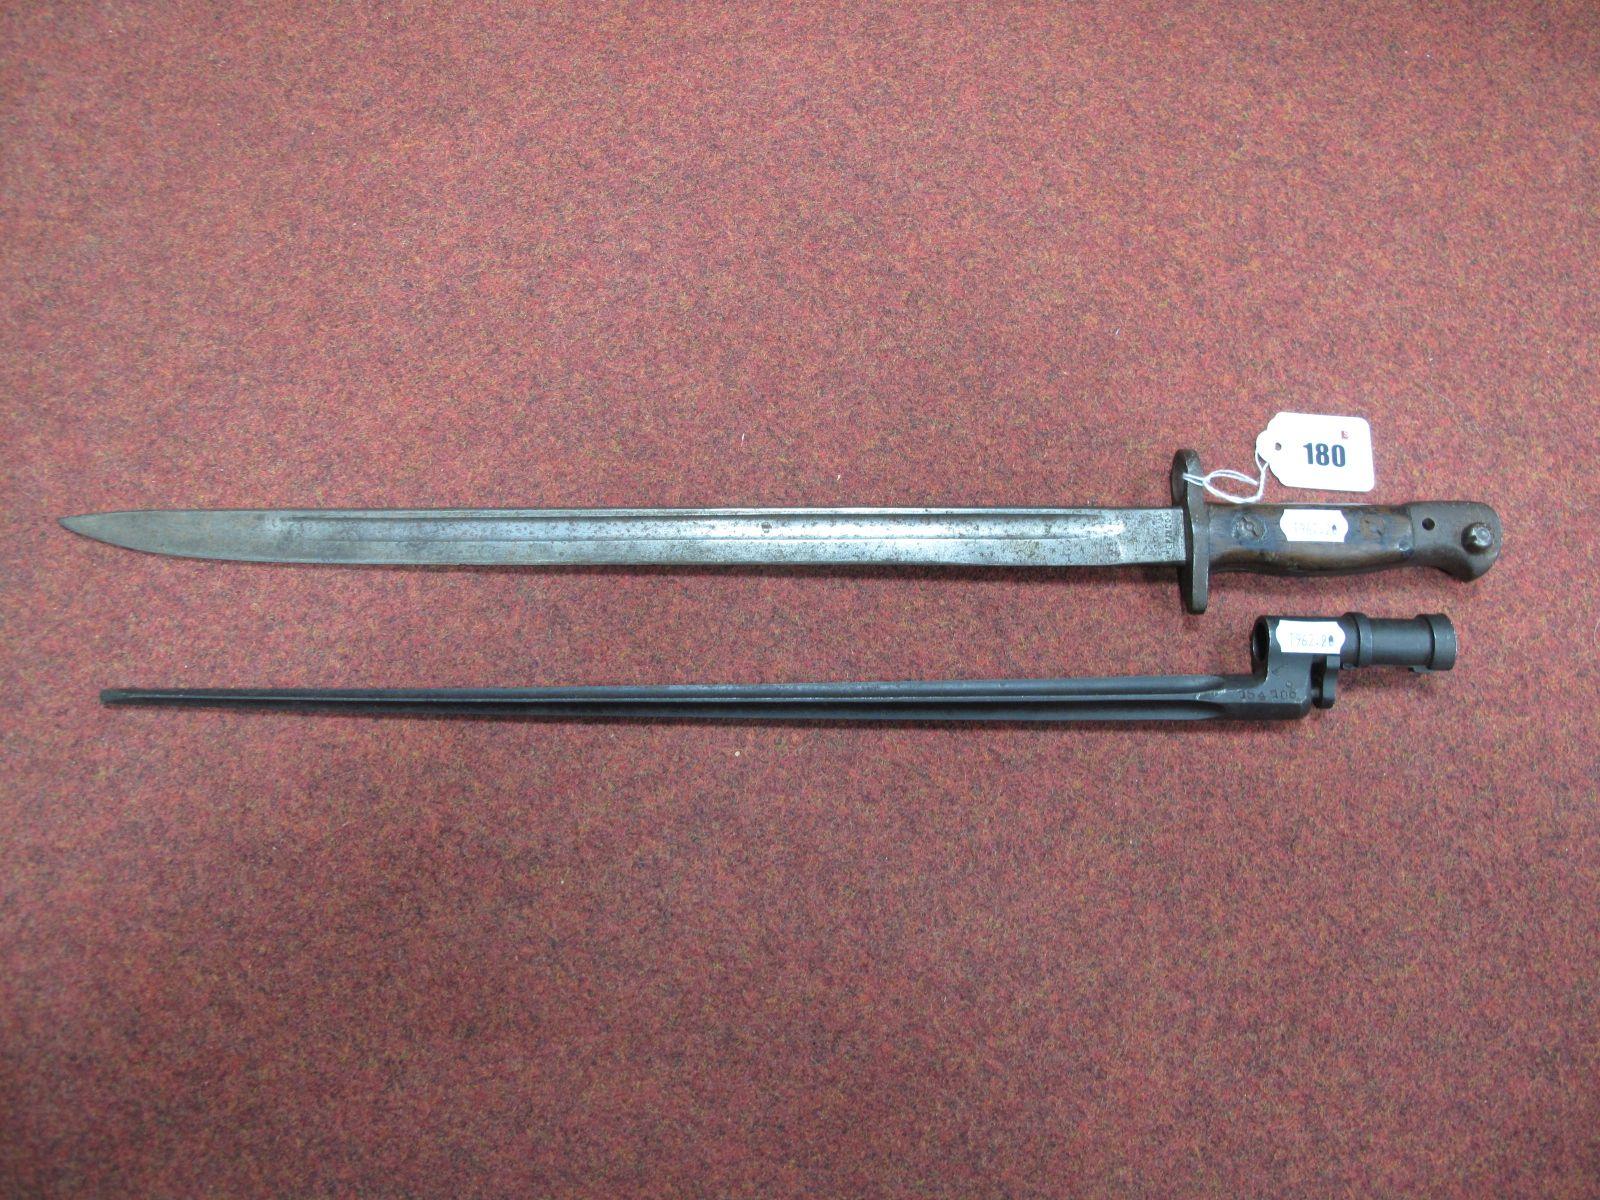 A British 1907 Pattern Bayonet, poor condition and a XIX Century crucifix blade bayonet.